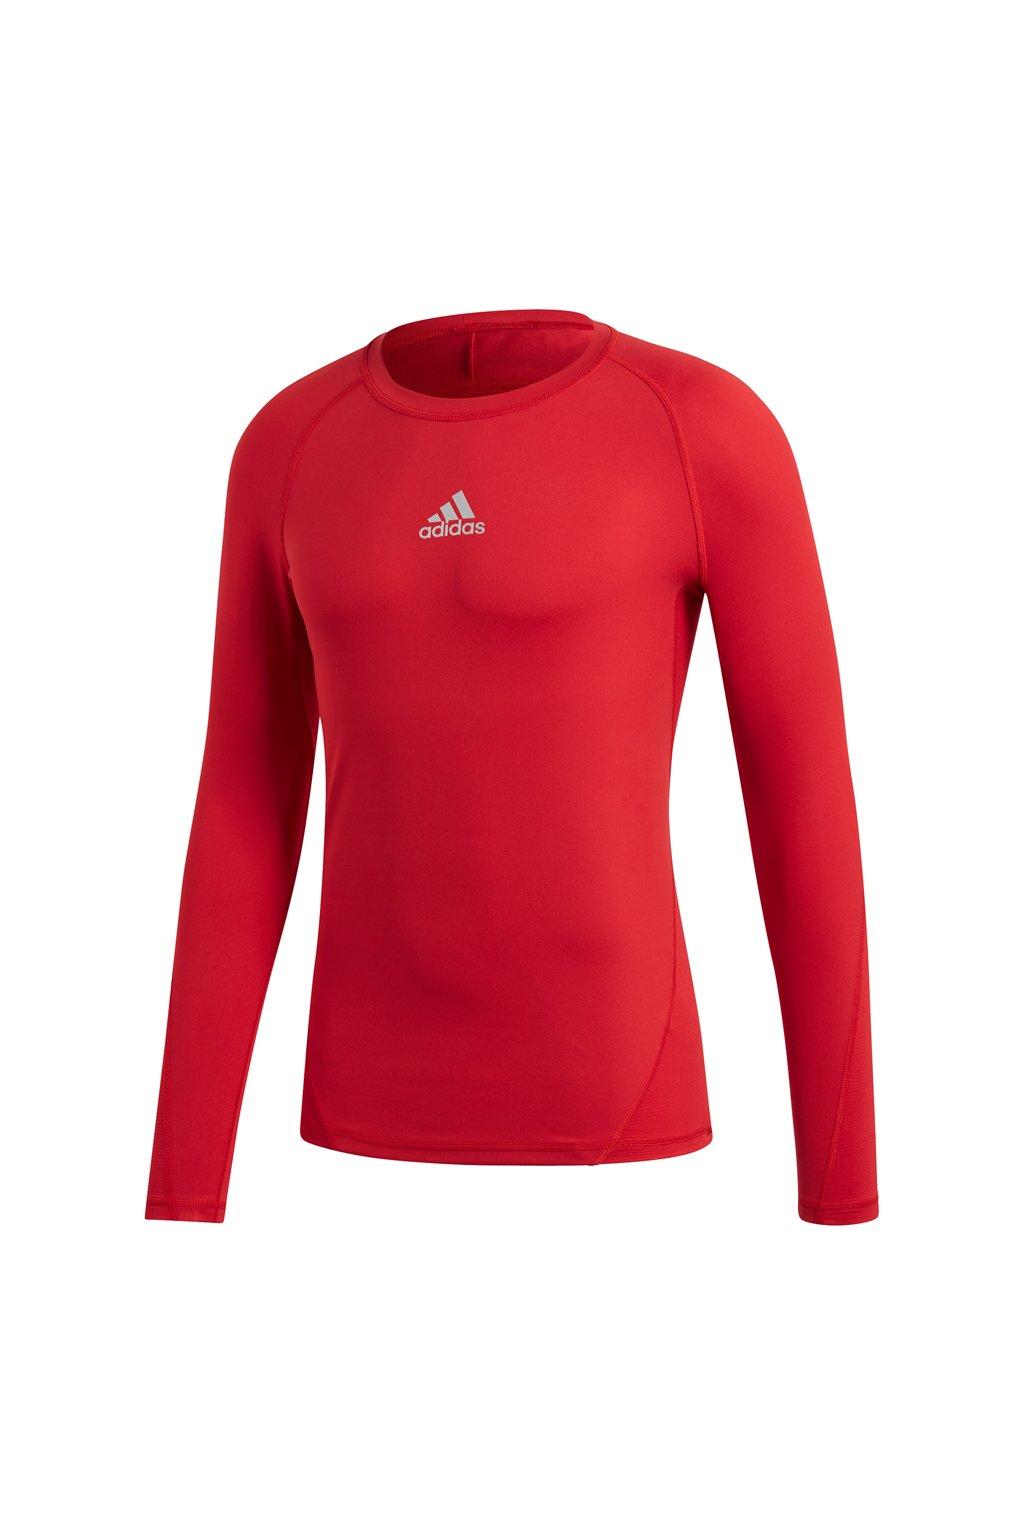 Pánske tričko Adidas Alphaskin Sport LS Tee red CW9490